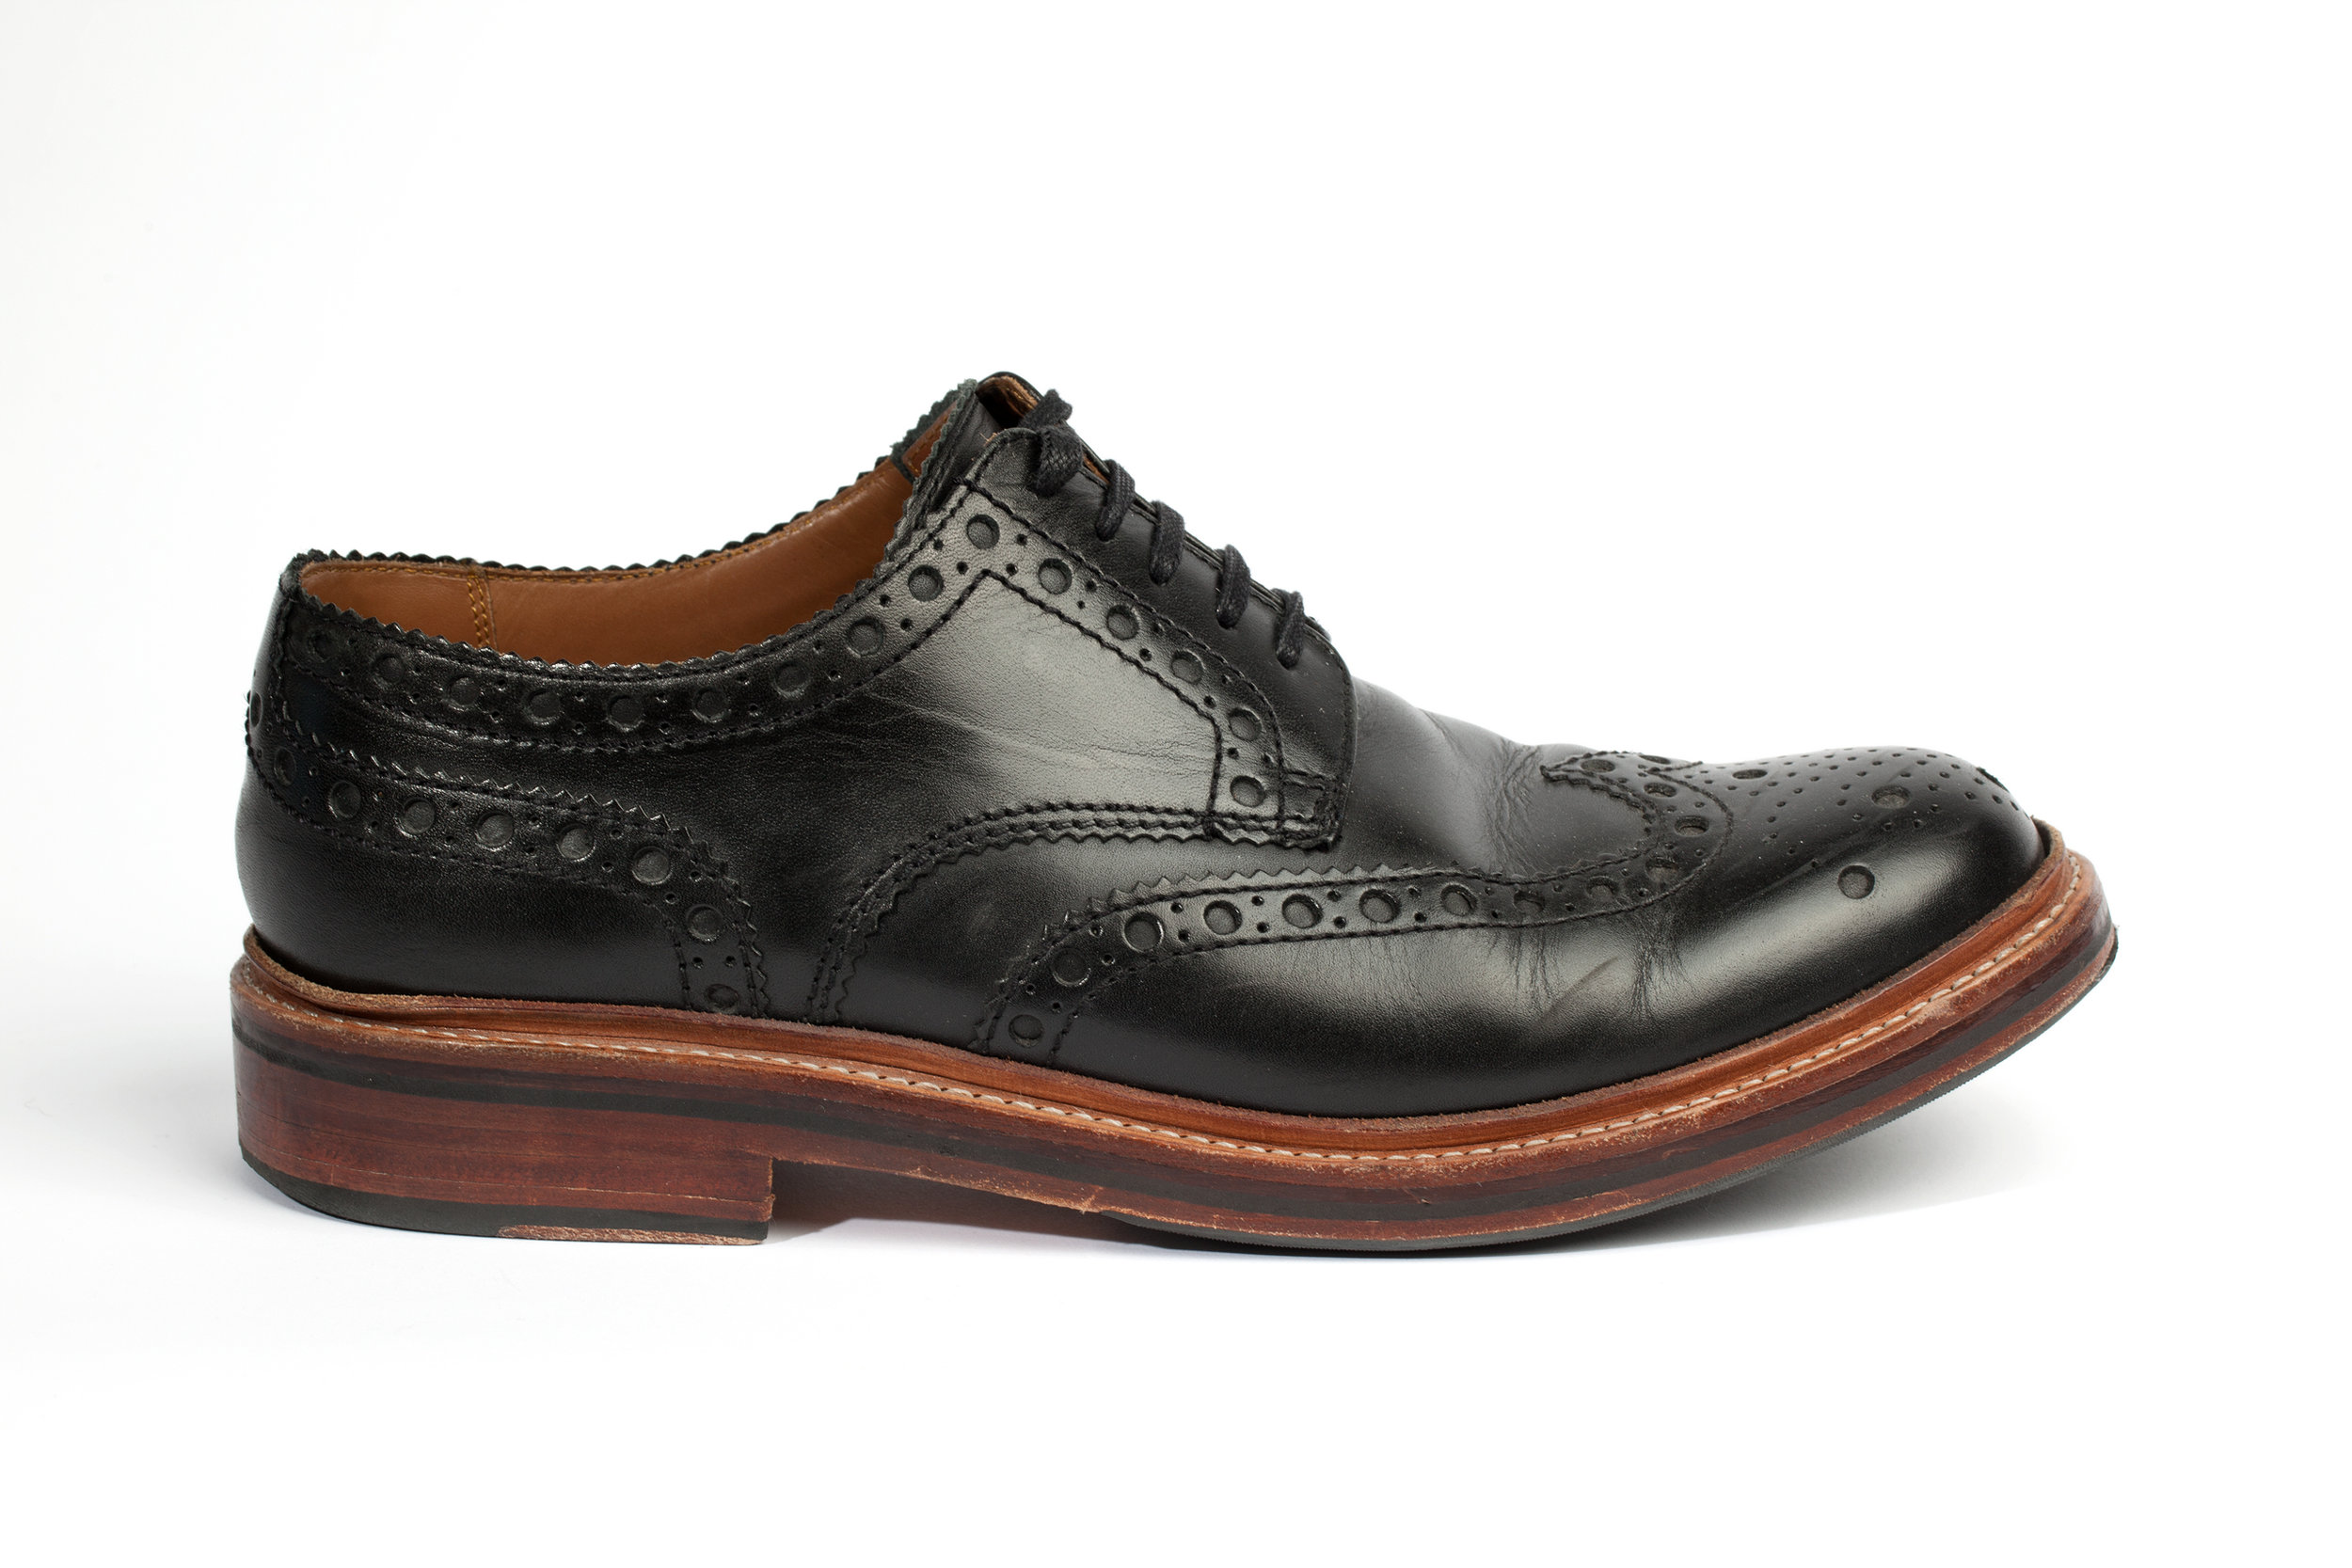 Grenson Archie shoe.